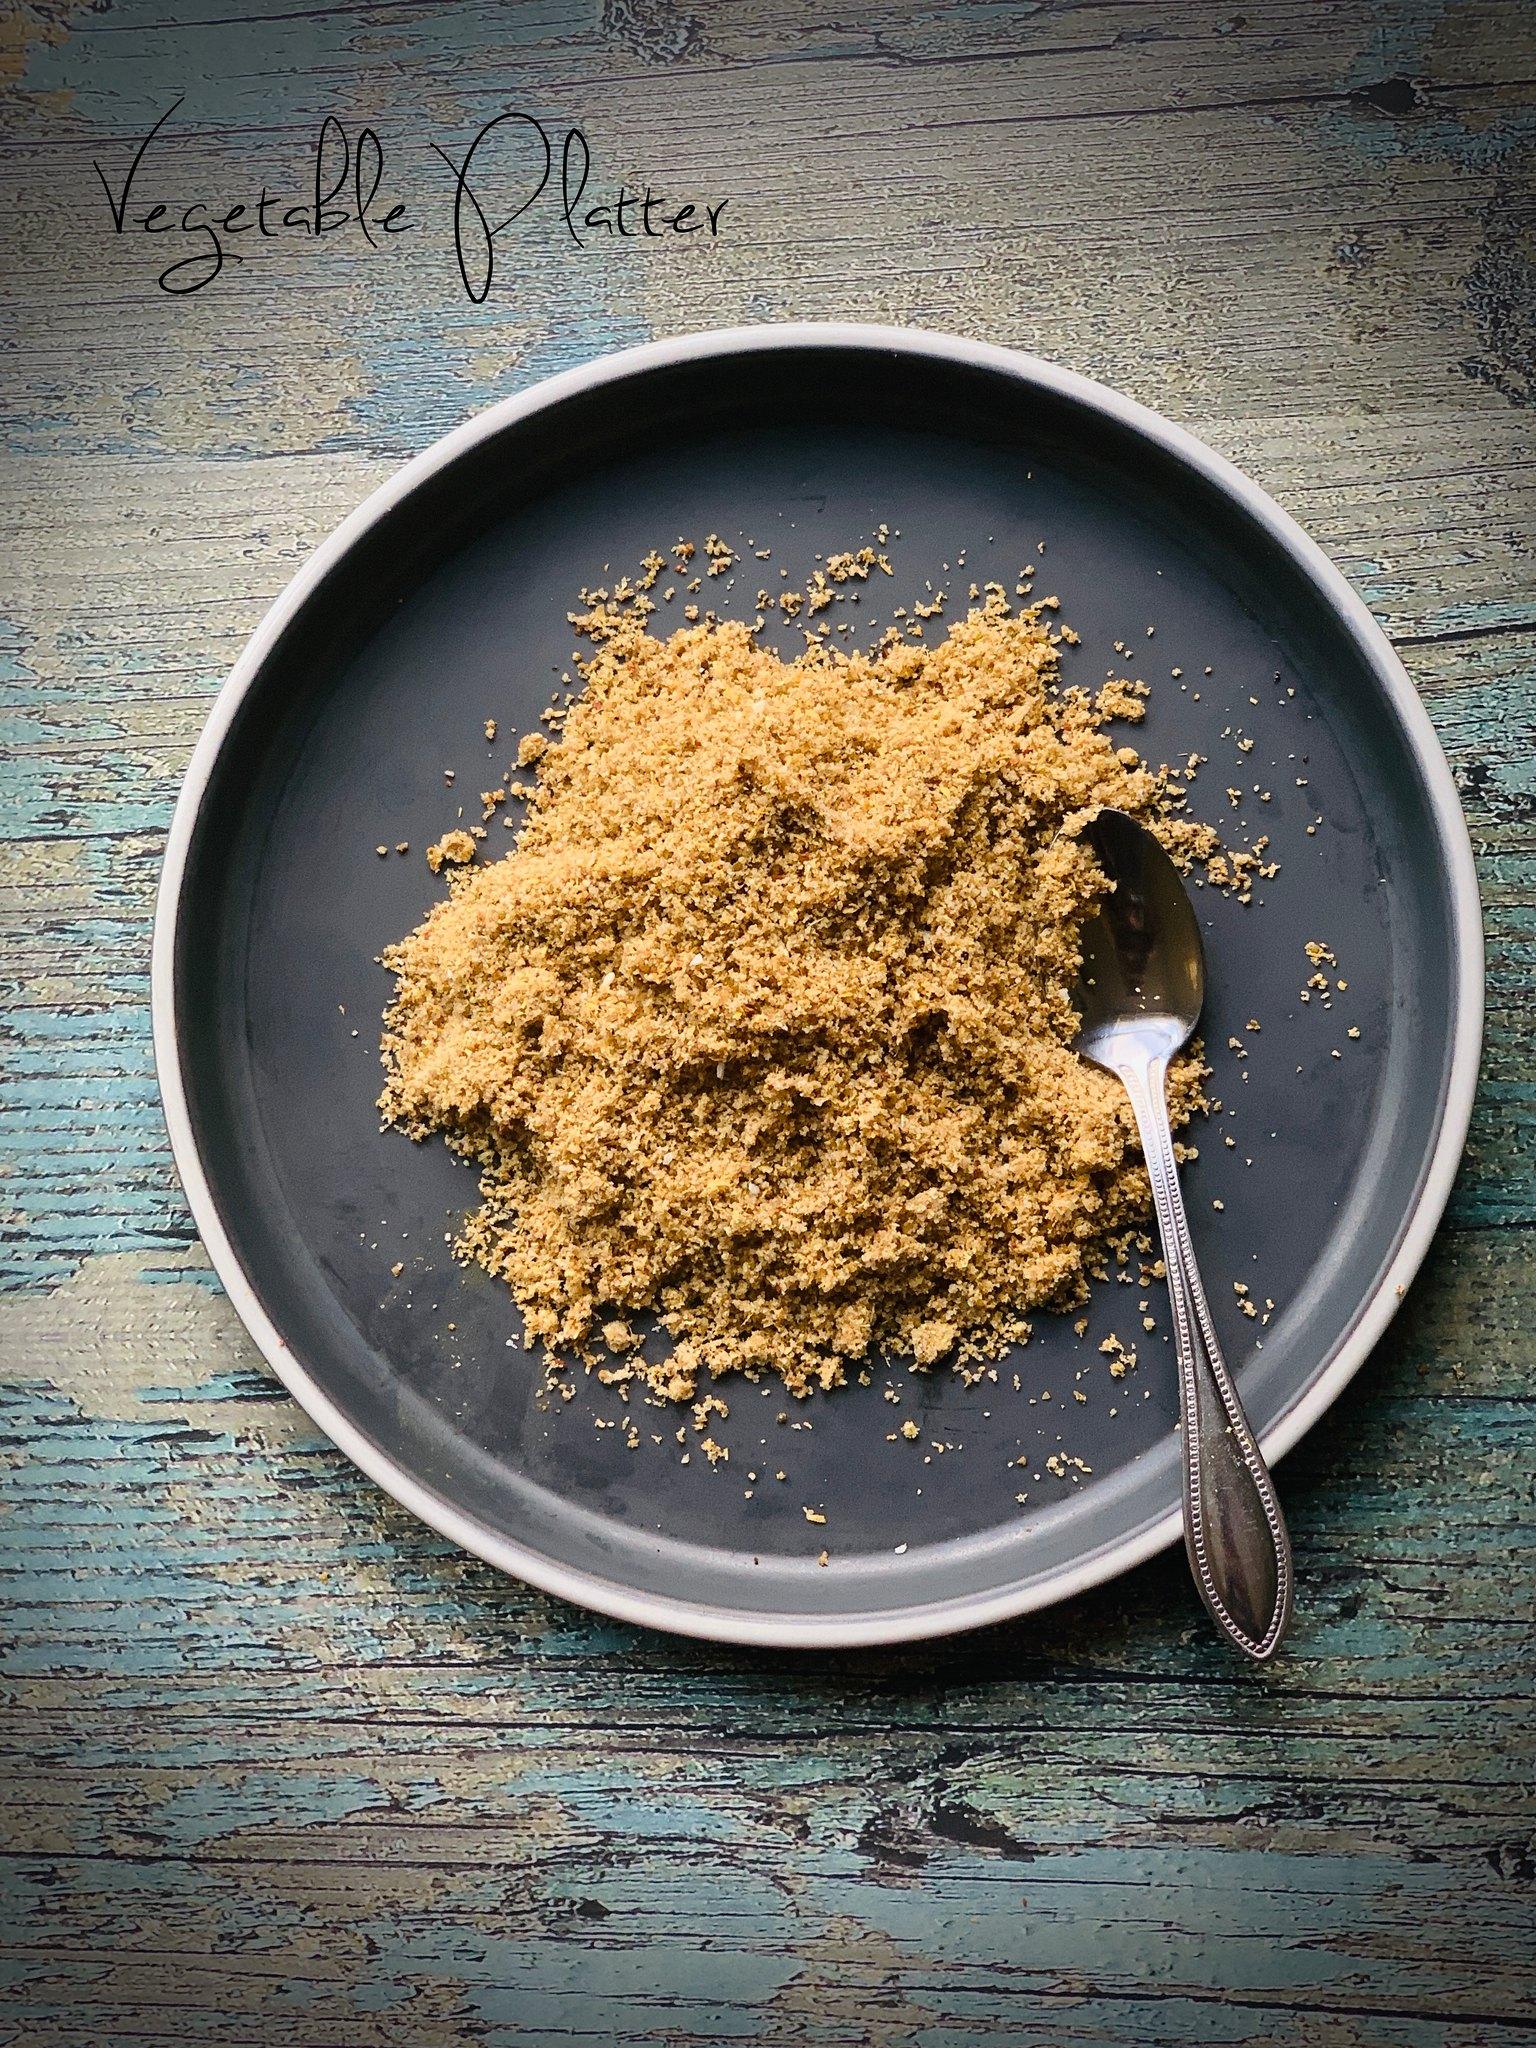 Spice Powder For Tendli Bhaat